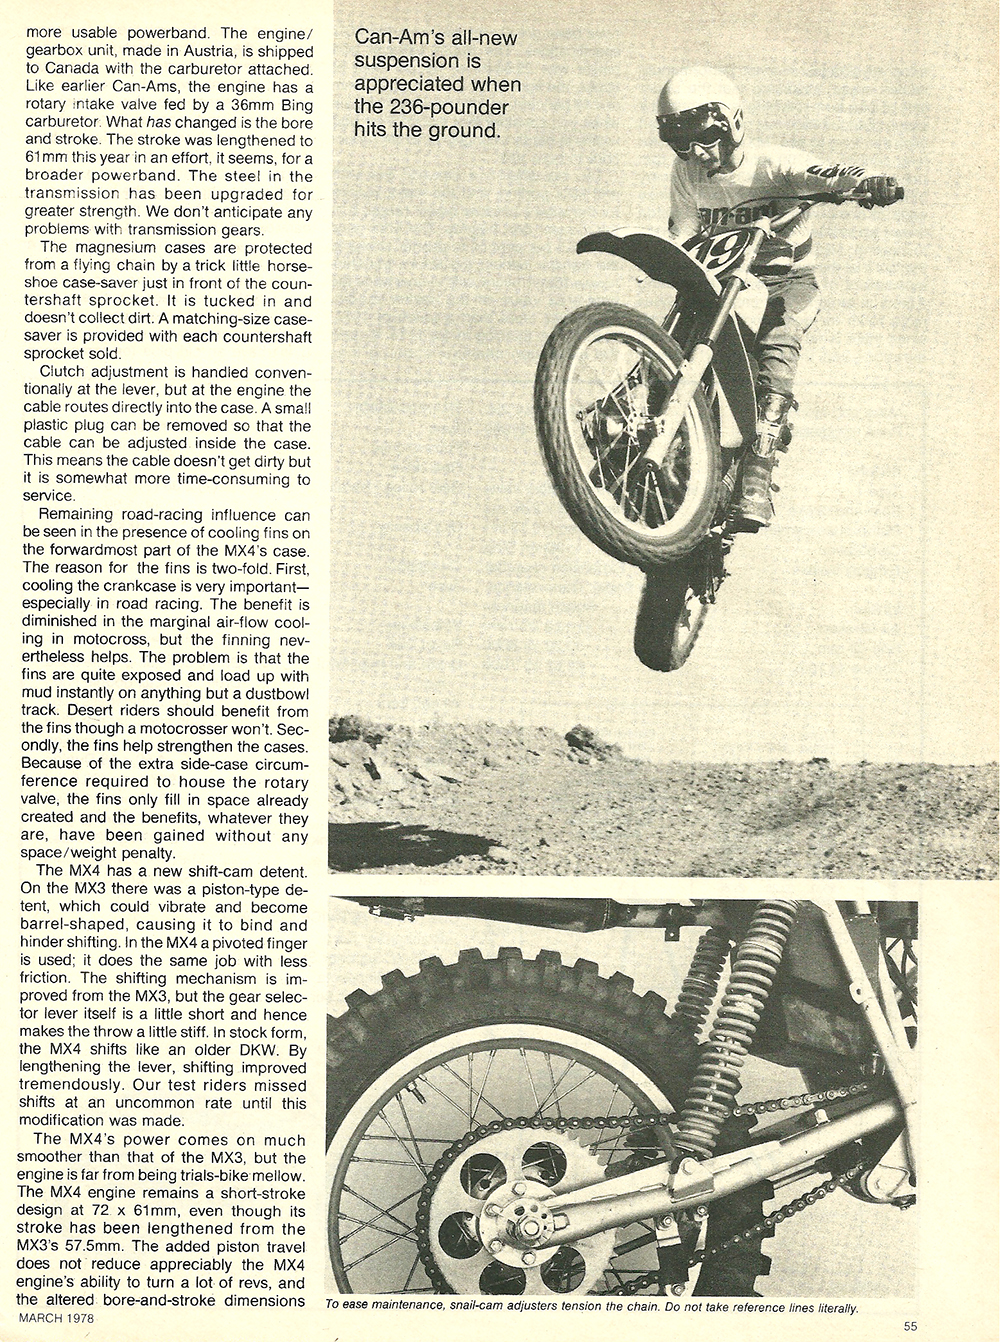 1978 Can-Am MX4 250 road test 4.jpg